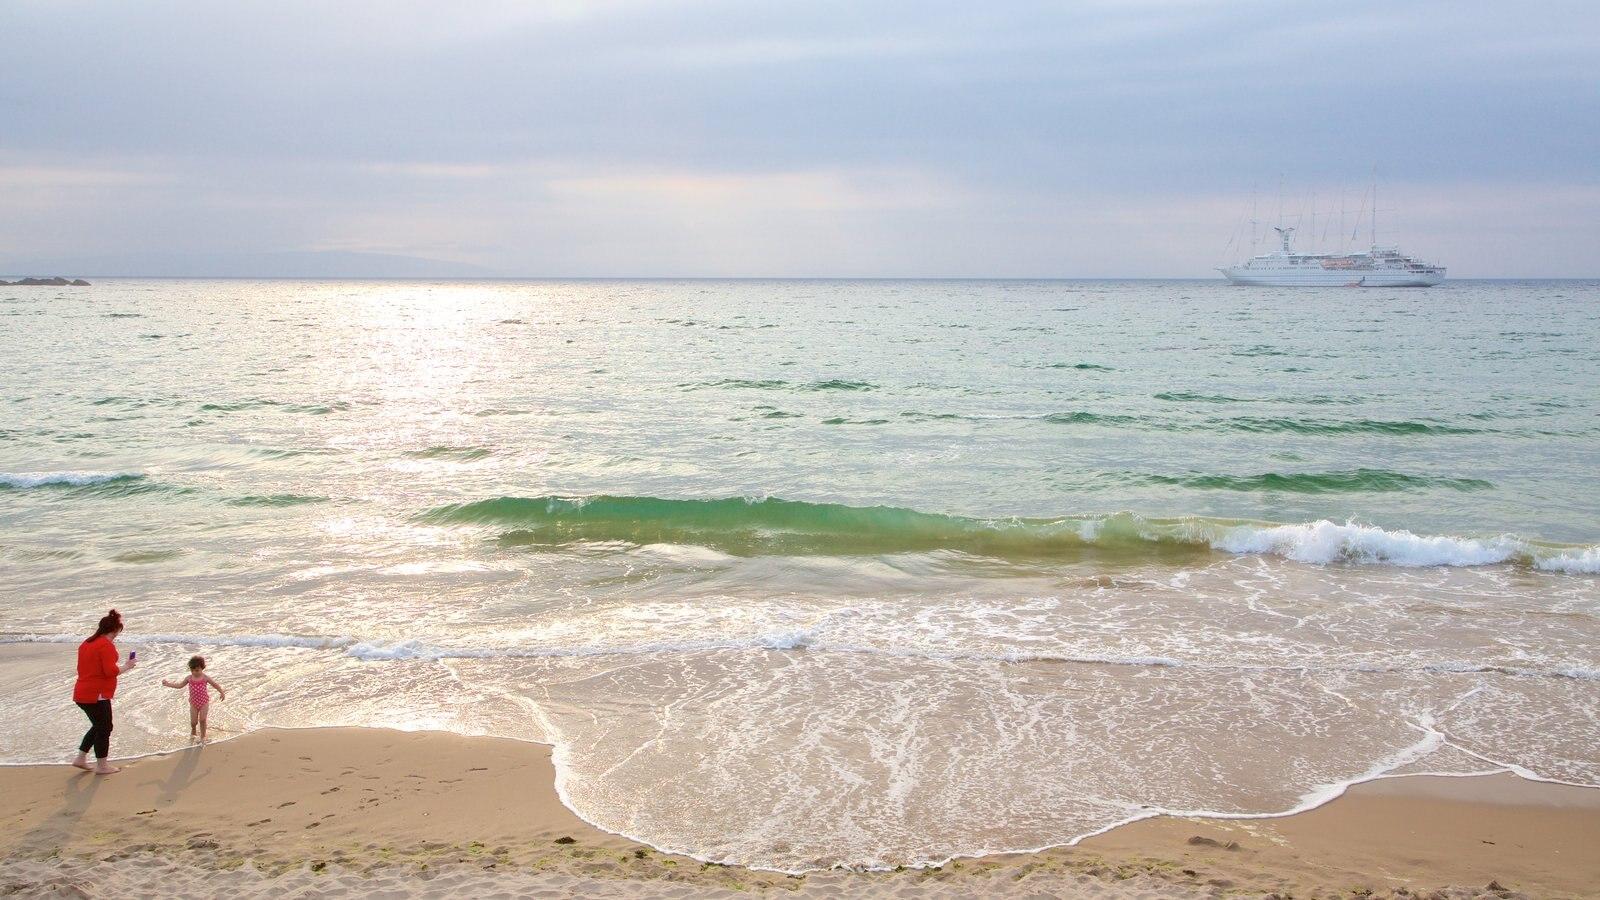 Portrush Beach which includes cruising, general coastal views and a sandy beach